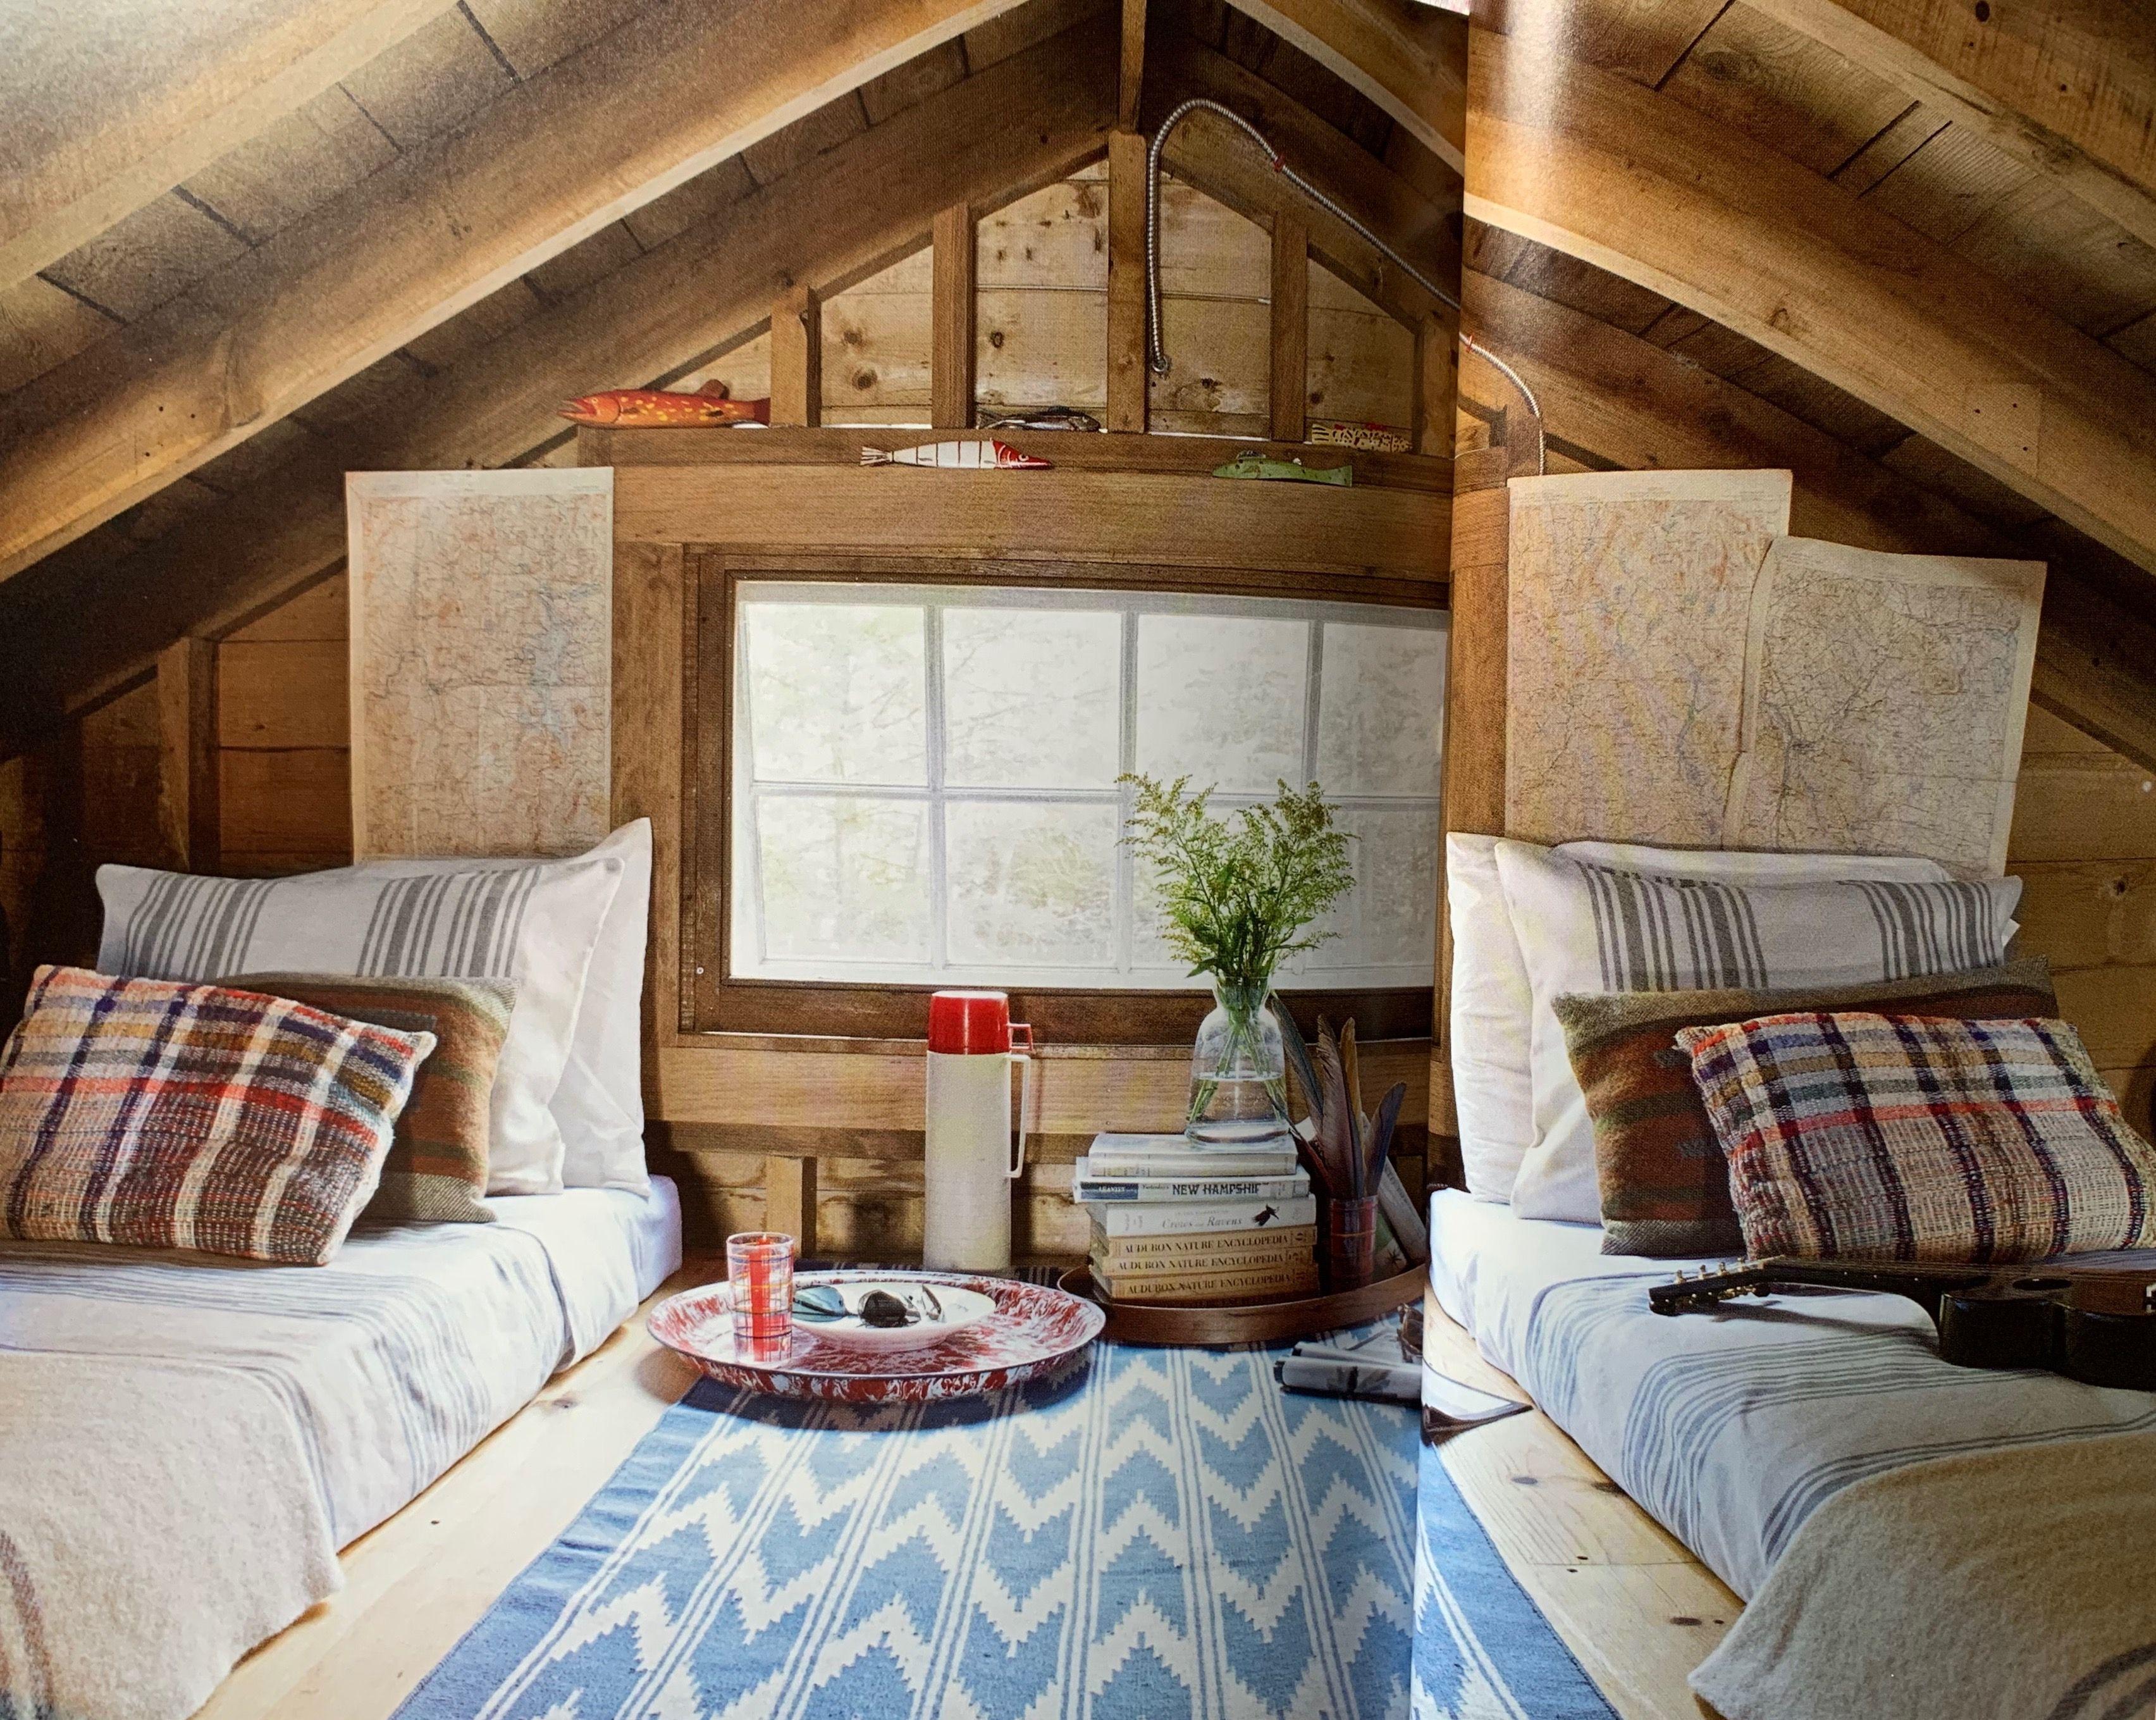 Pin By Kari Michalski On Cabin And Shed Ideas Lakehouse Decor Lake House Furniture Sleeping Loft